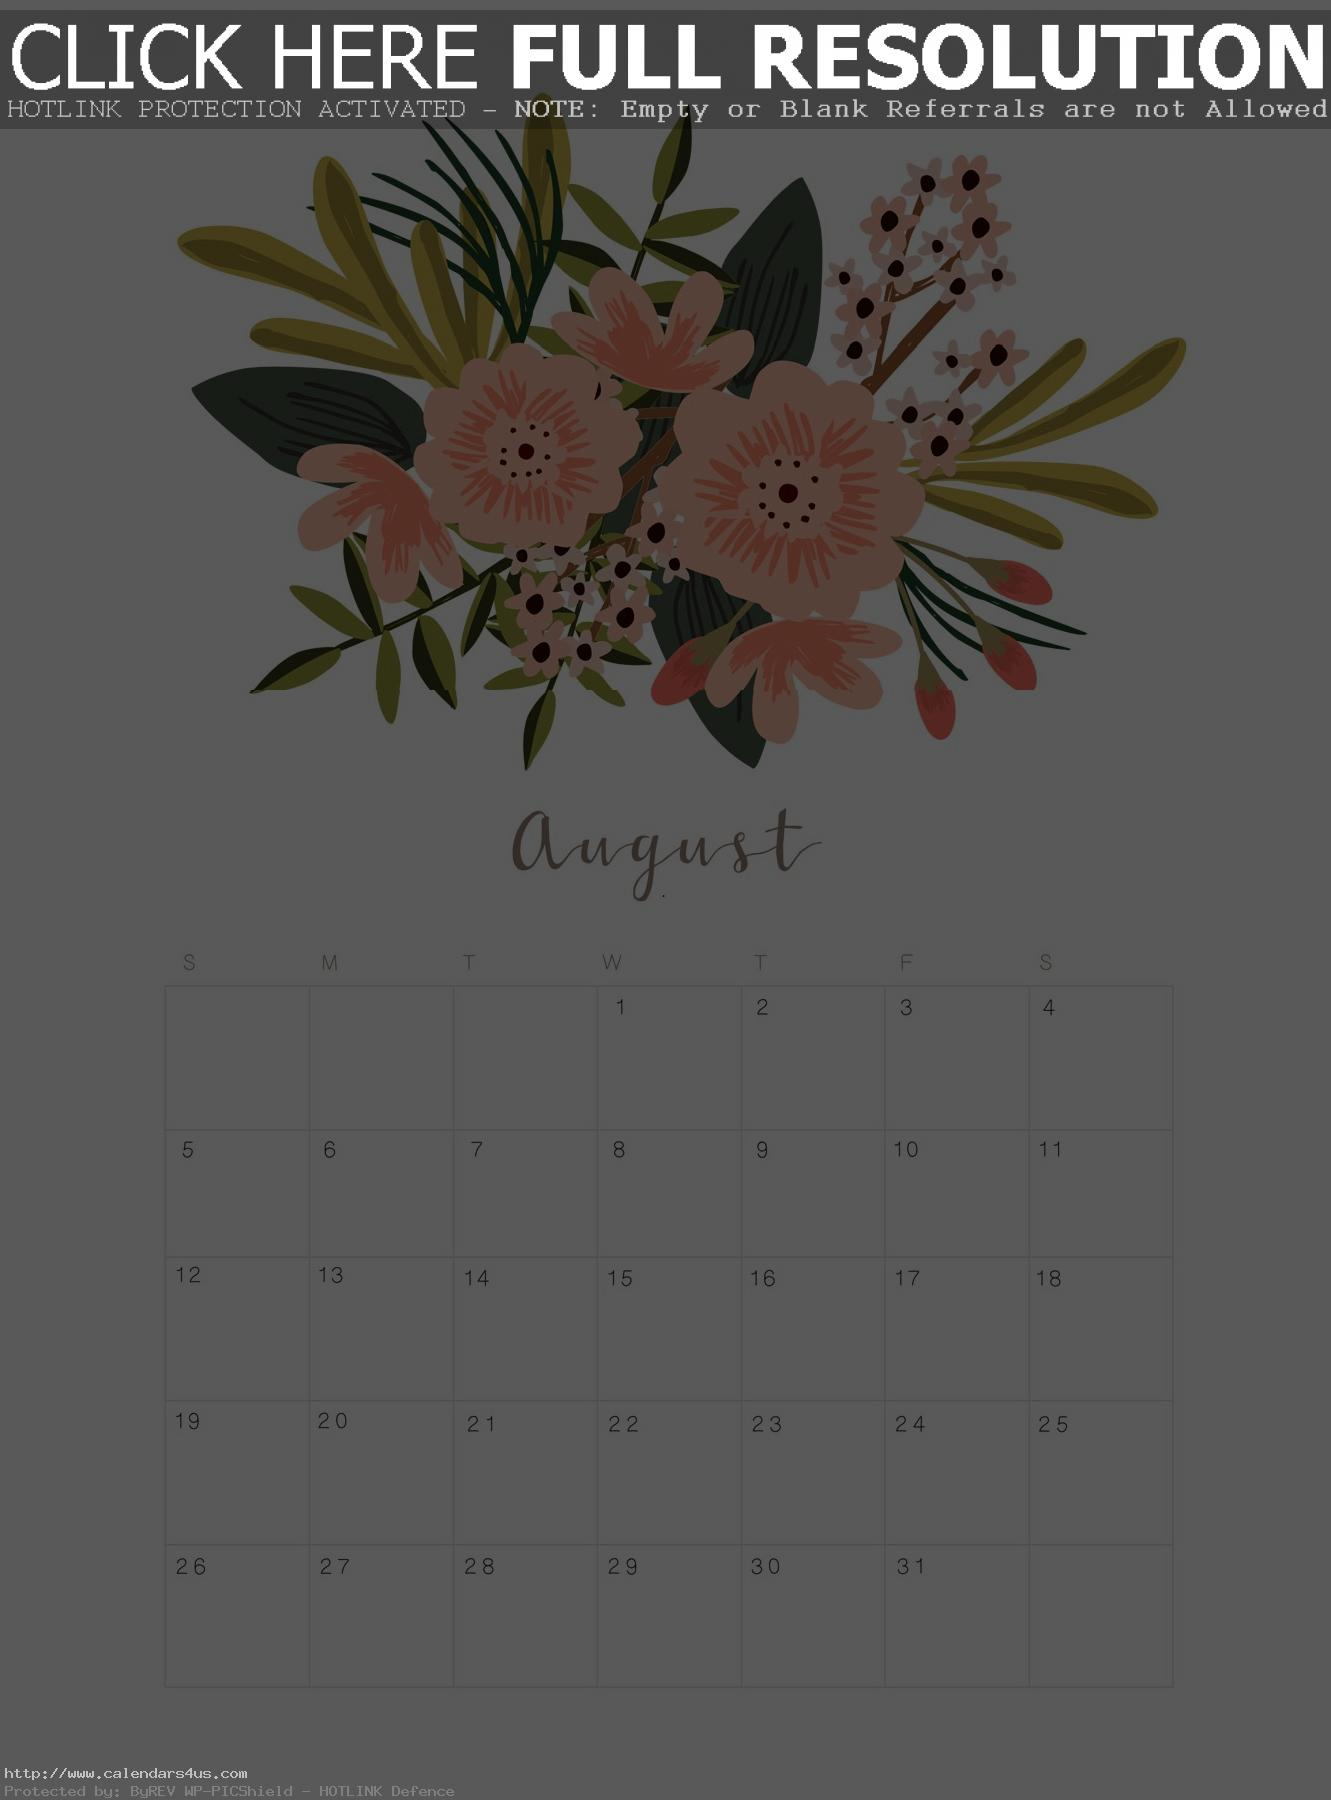 Print August 2018 Floral Calendar